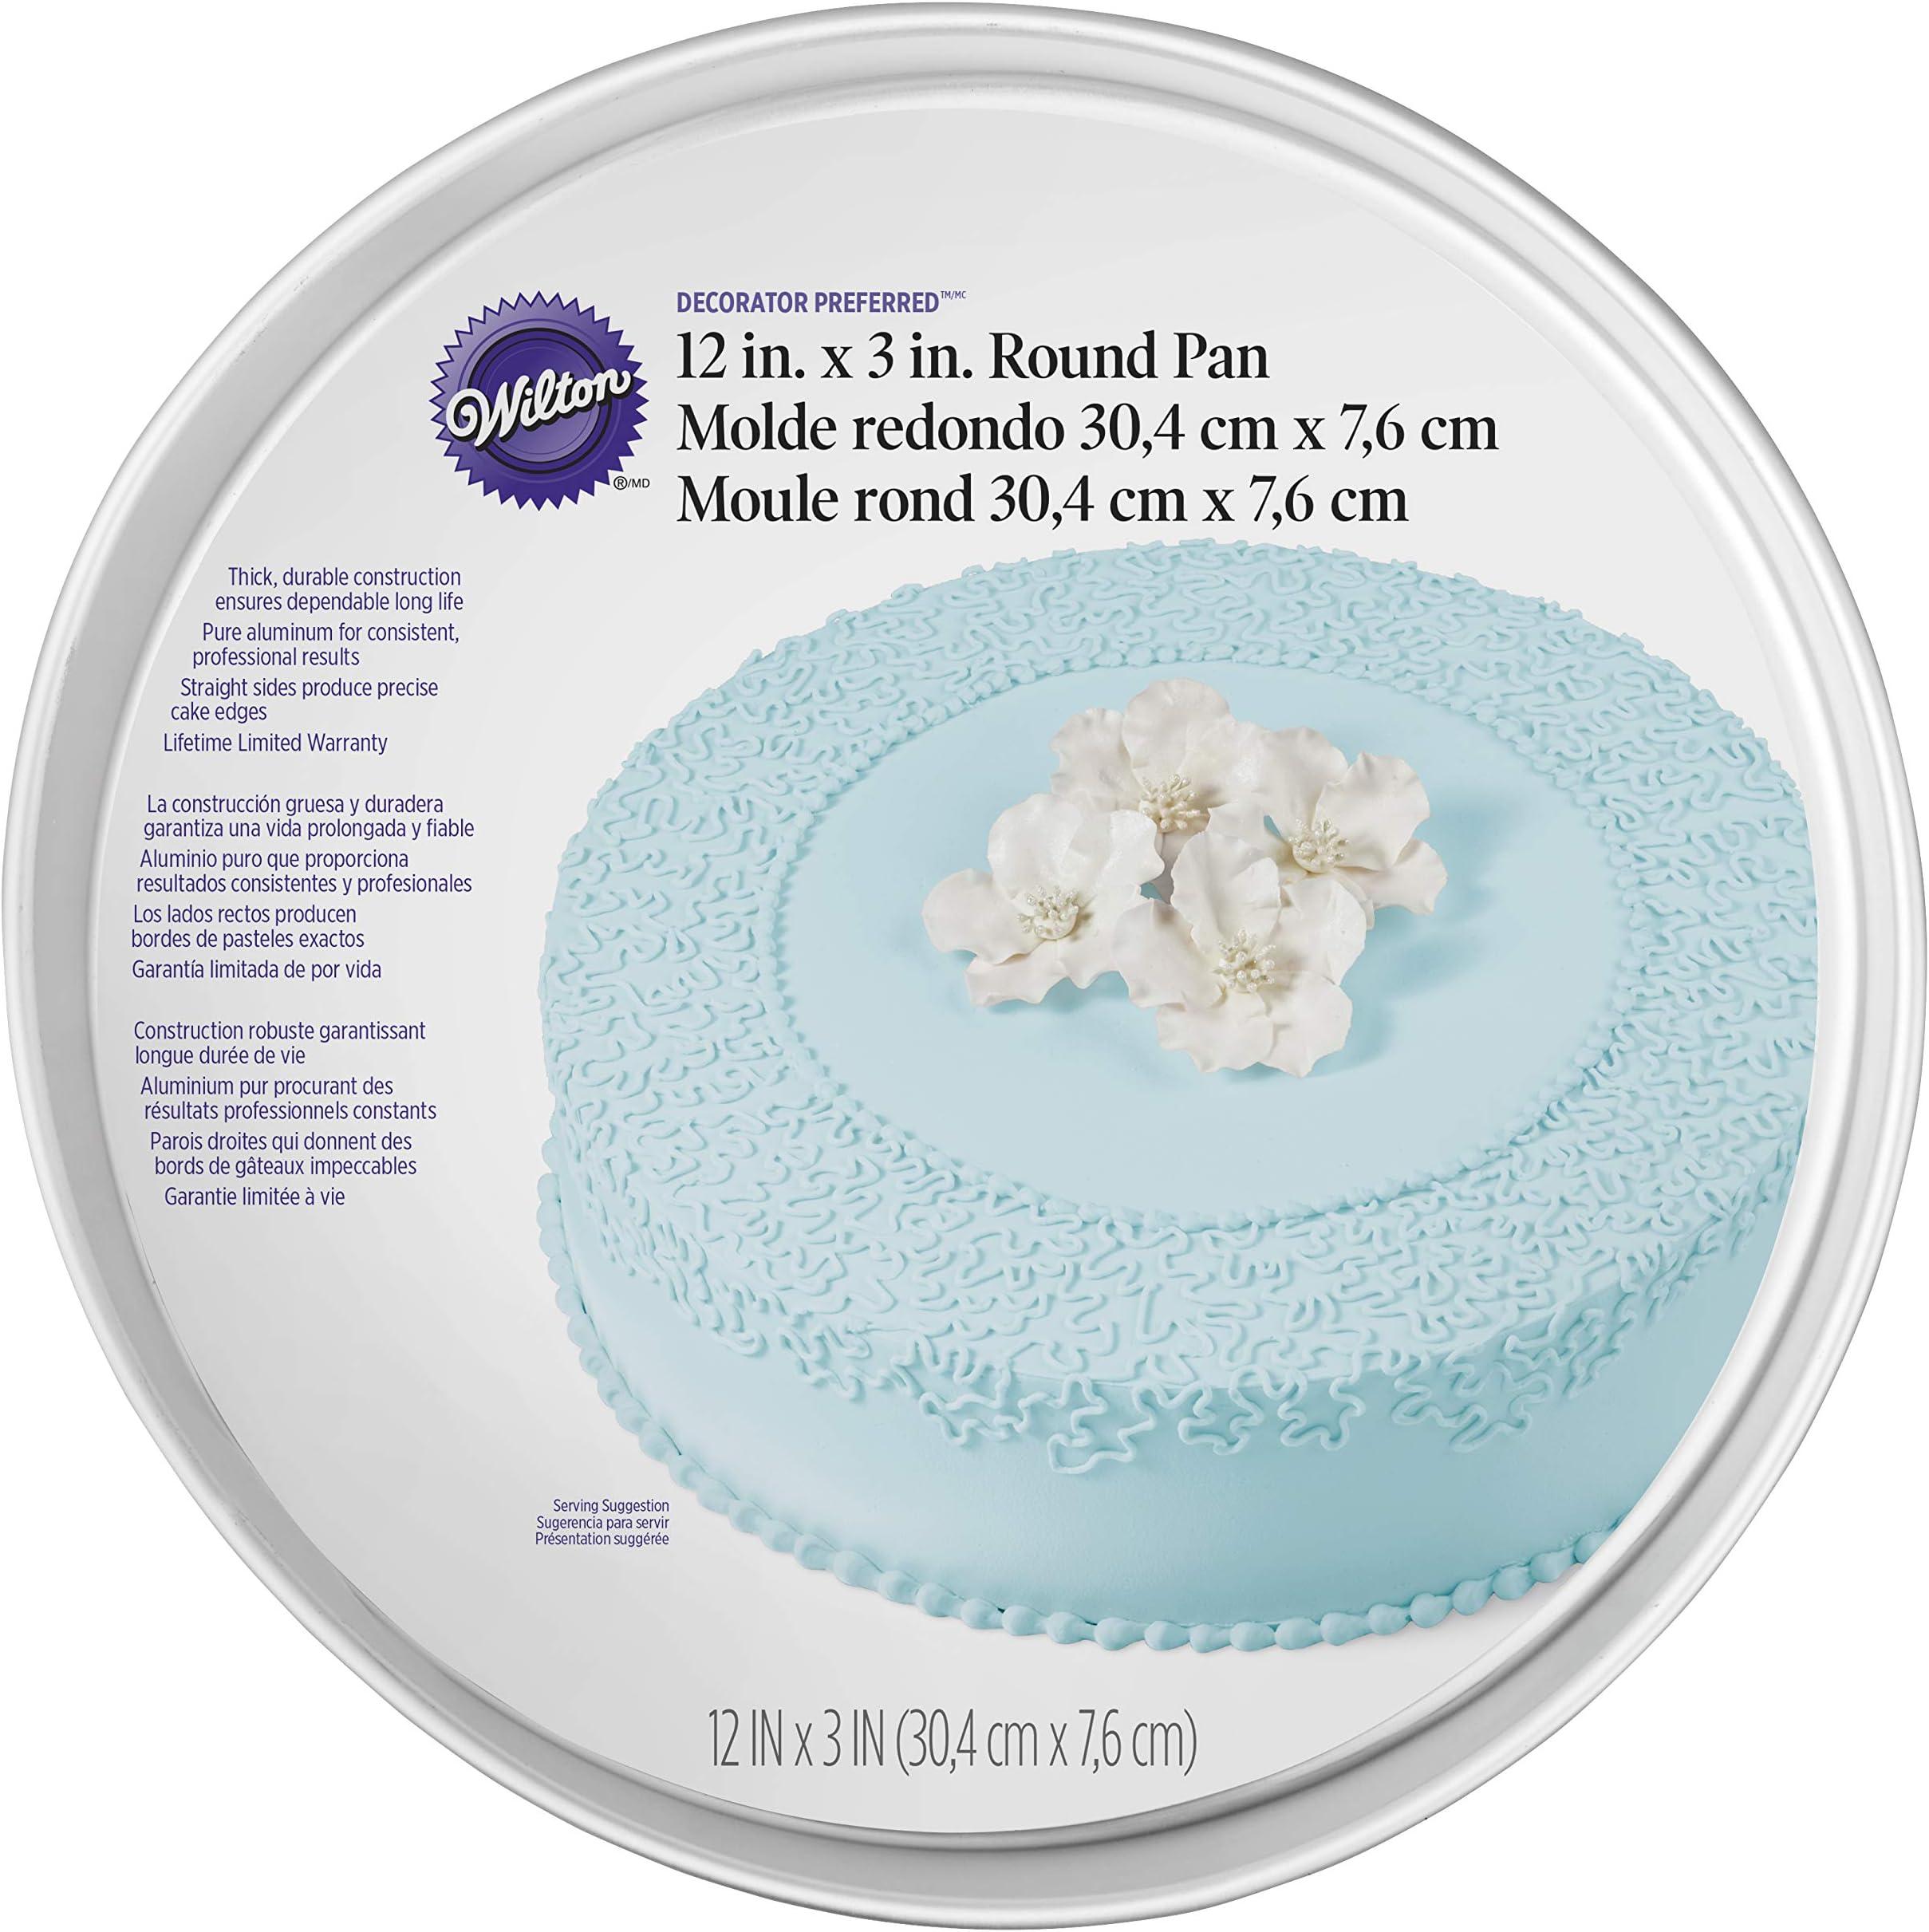 Wilton Decorator Preferred Aluminum Round Cake Pan, 3 x 12 inch